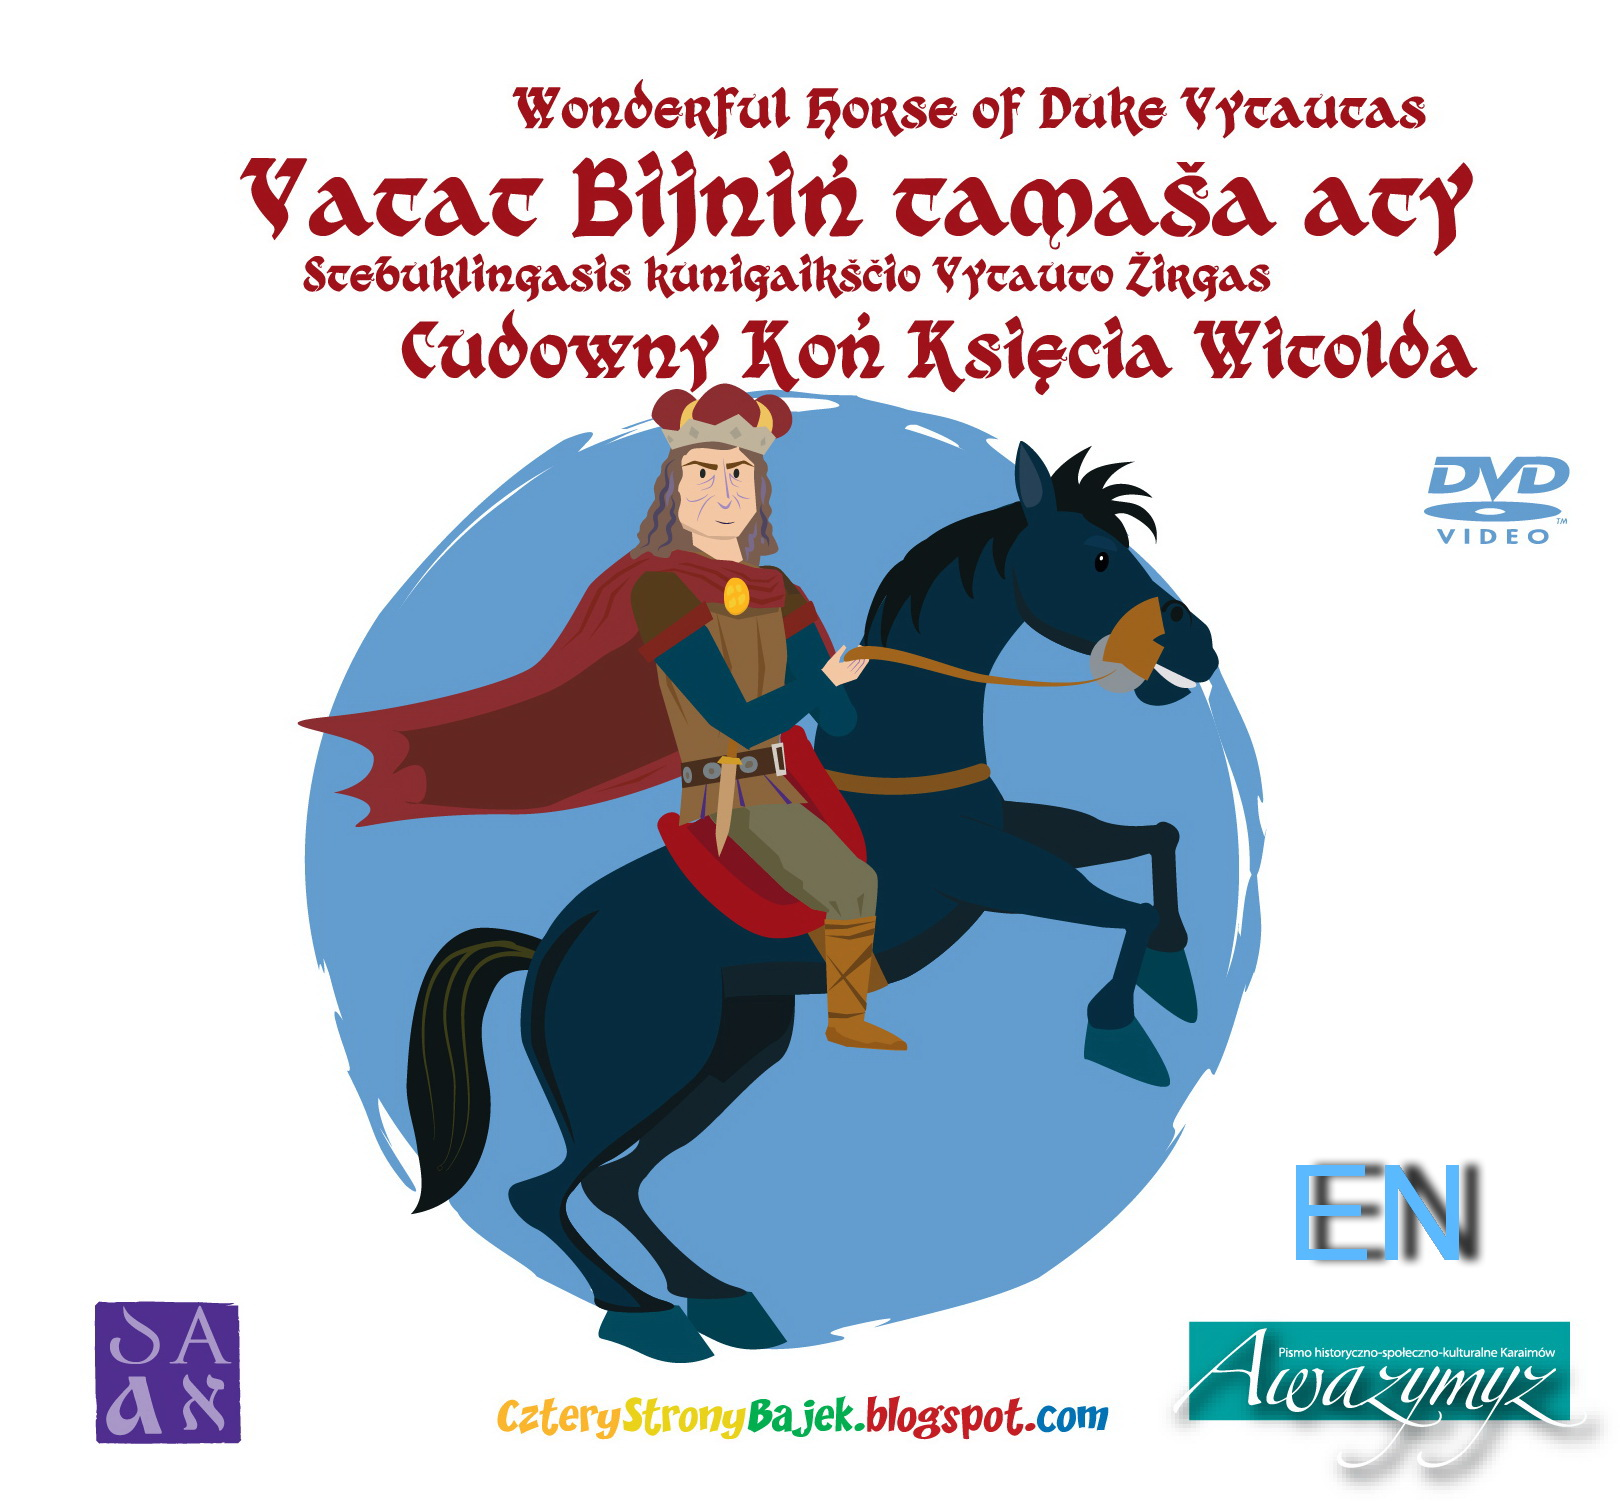 Wonderful horse of Duke Vitautas